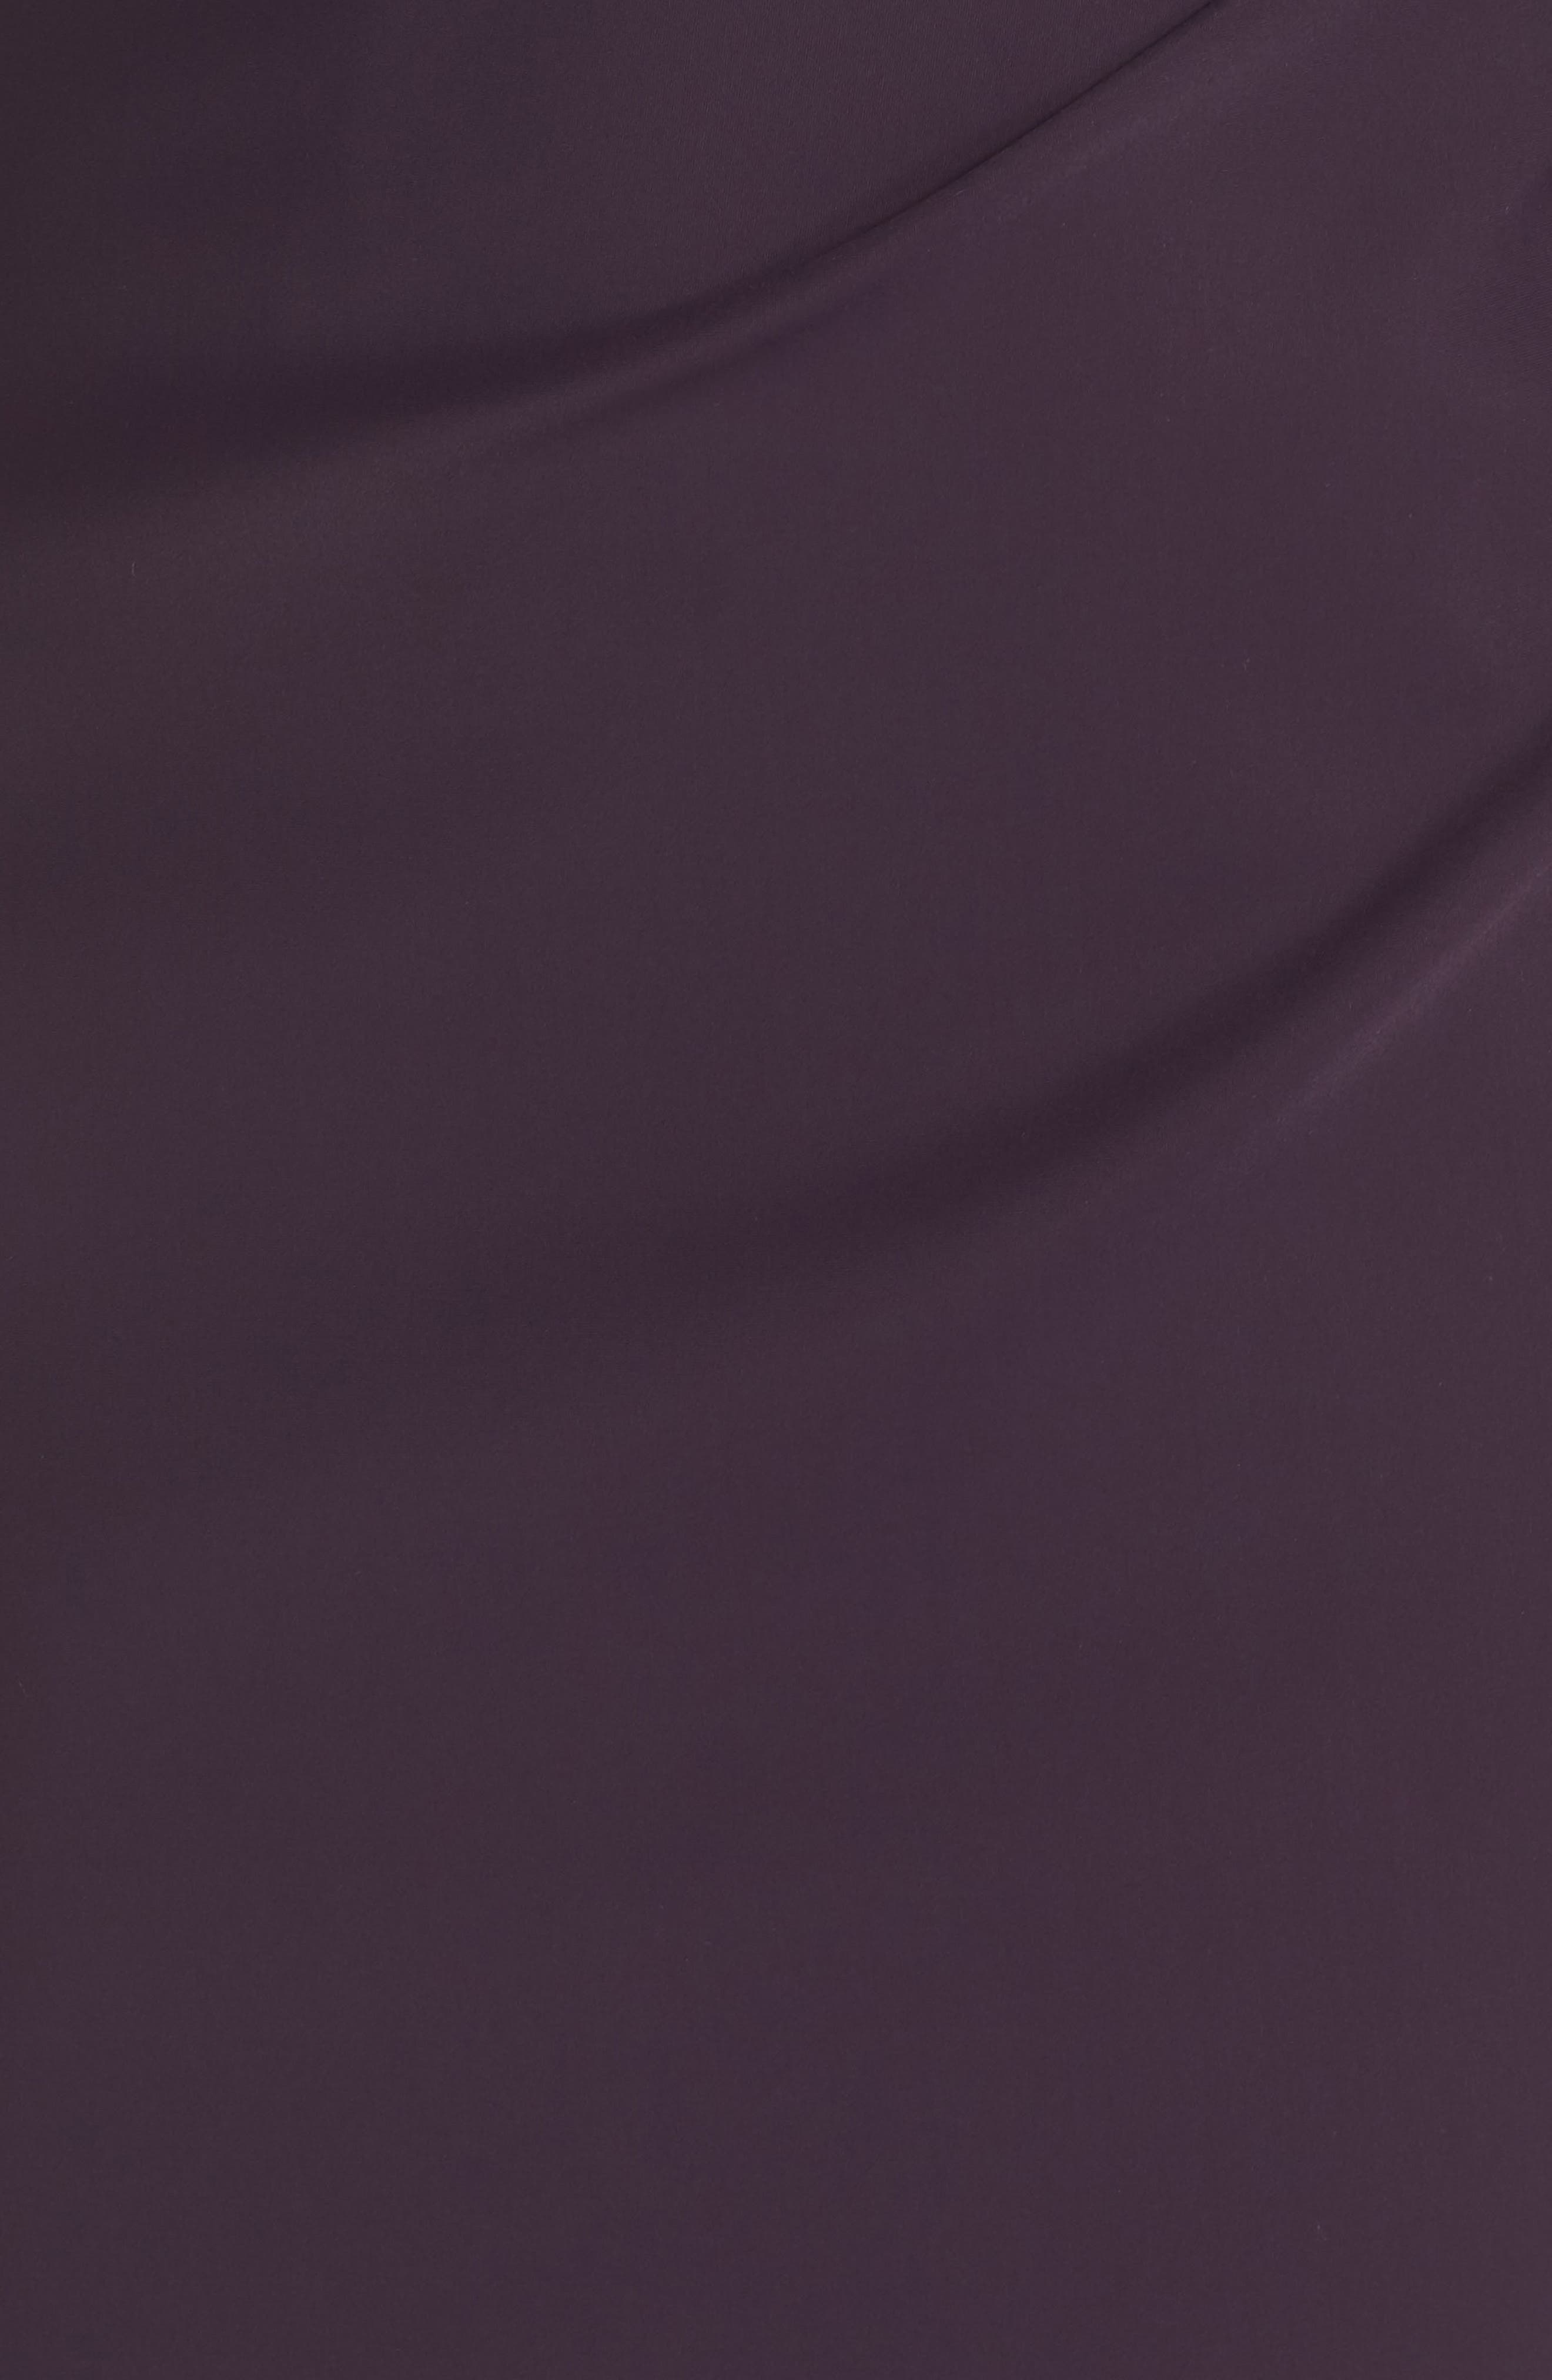 Embellished Side Drape Column Gown,                             Alternate thumbnail 5, color,                             Aubergine